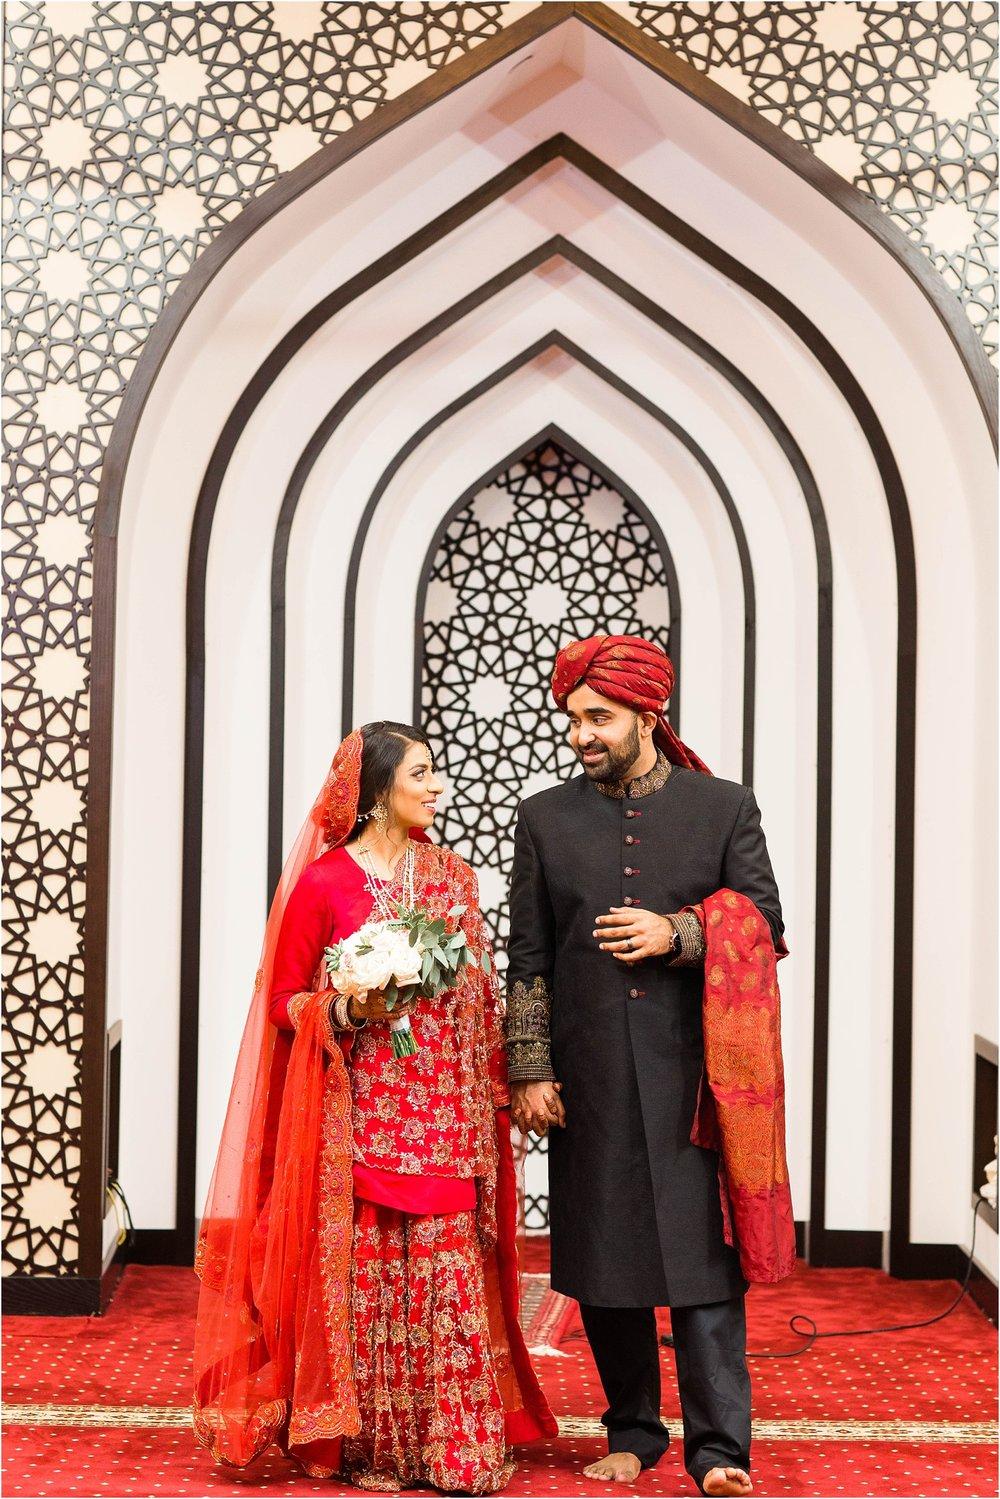 Jame-Masjid-Coopers-Mosque-Kariya-Park-Cherry-Blossoms-Wedding-Toronto-Mississauga-Brampton-Scarborough-GTA-Pakistani-Indian-Wedding-Engagement-Photographer-Photography_0047.jpg